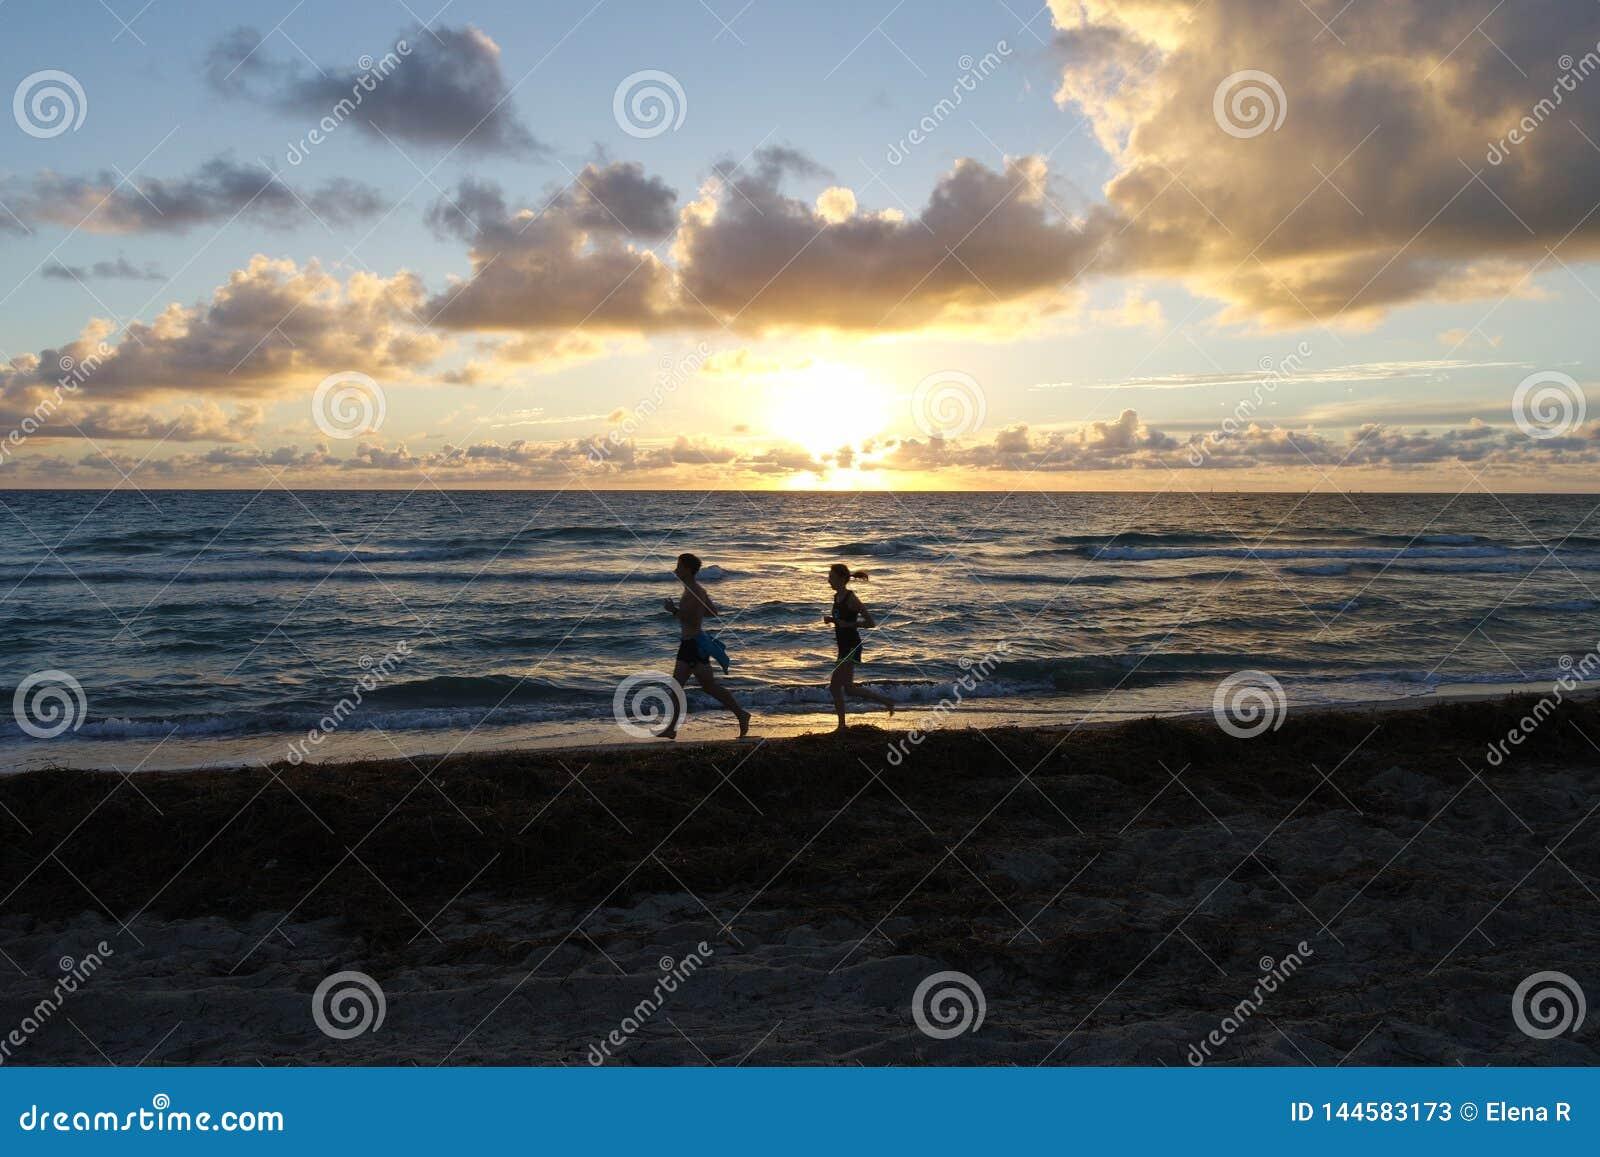 Morgenbetrieb nahe dem Meer